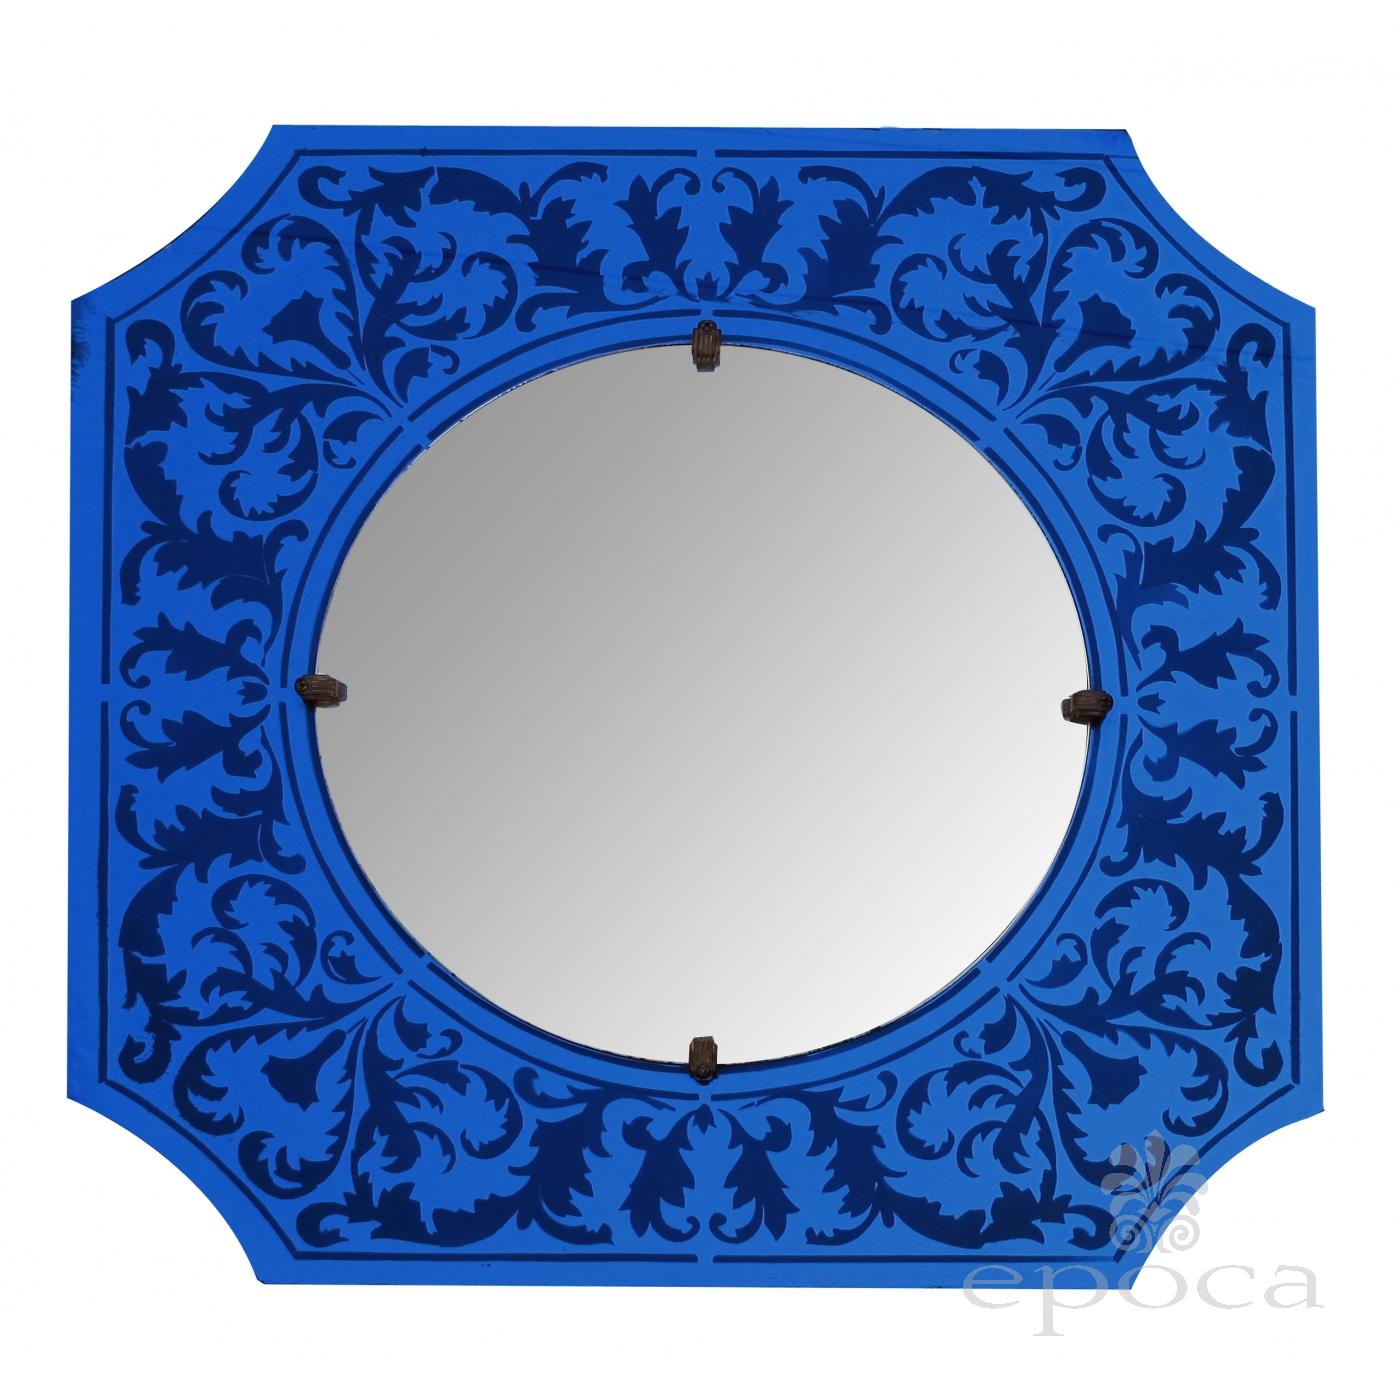 A Stylish American Art Deco Bulls Eye Mirror With Etched Cobalt Blue Frame